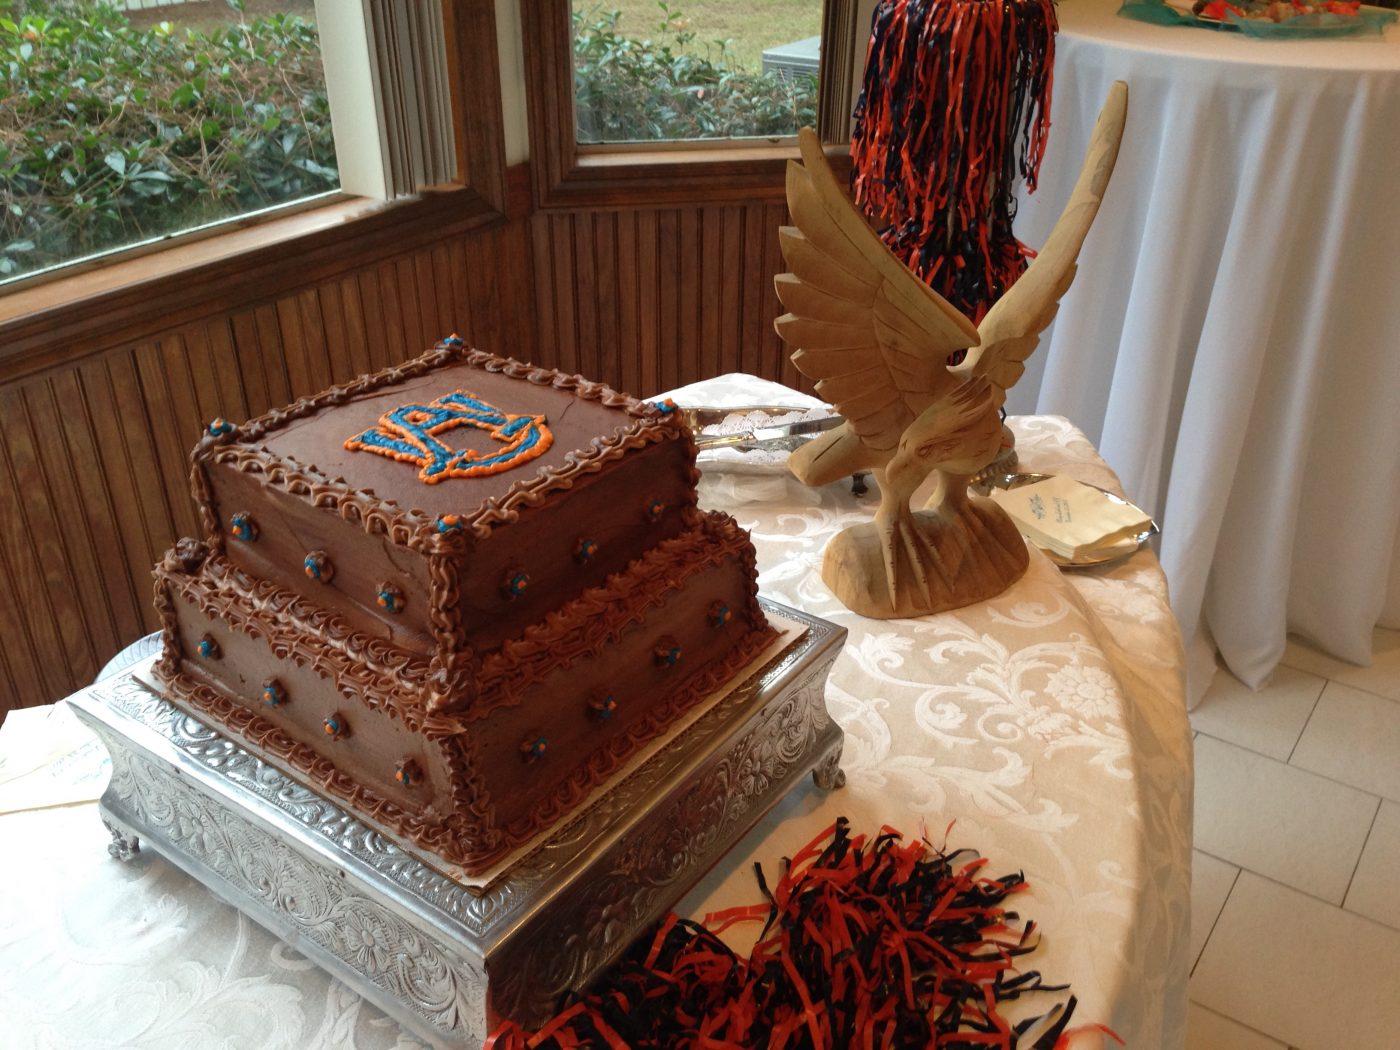 Auburn themed groom's cake